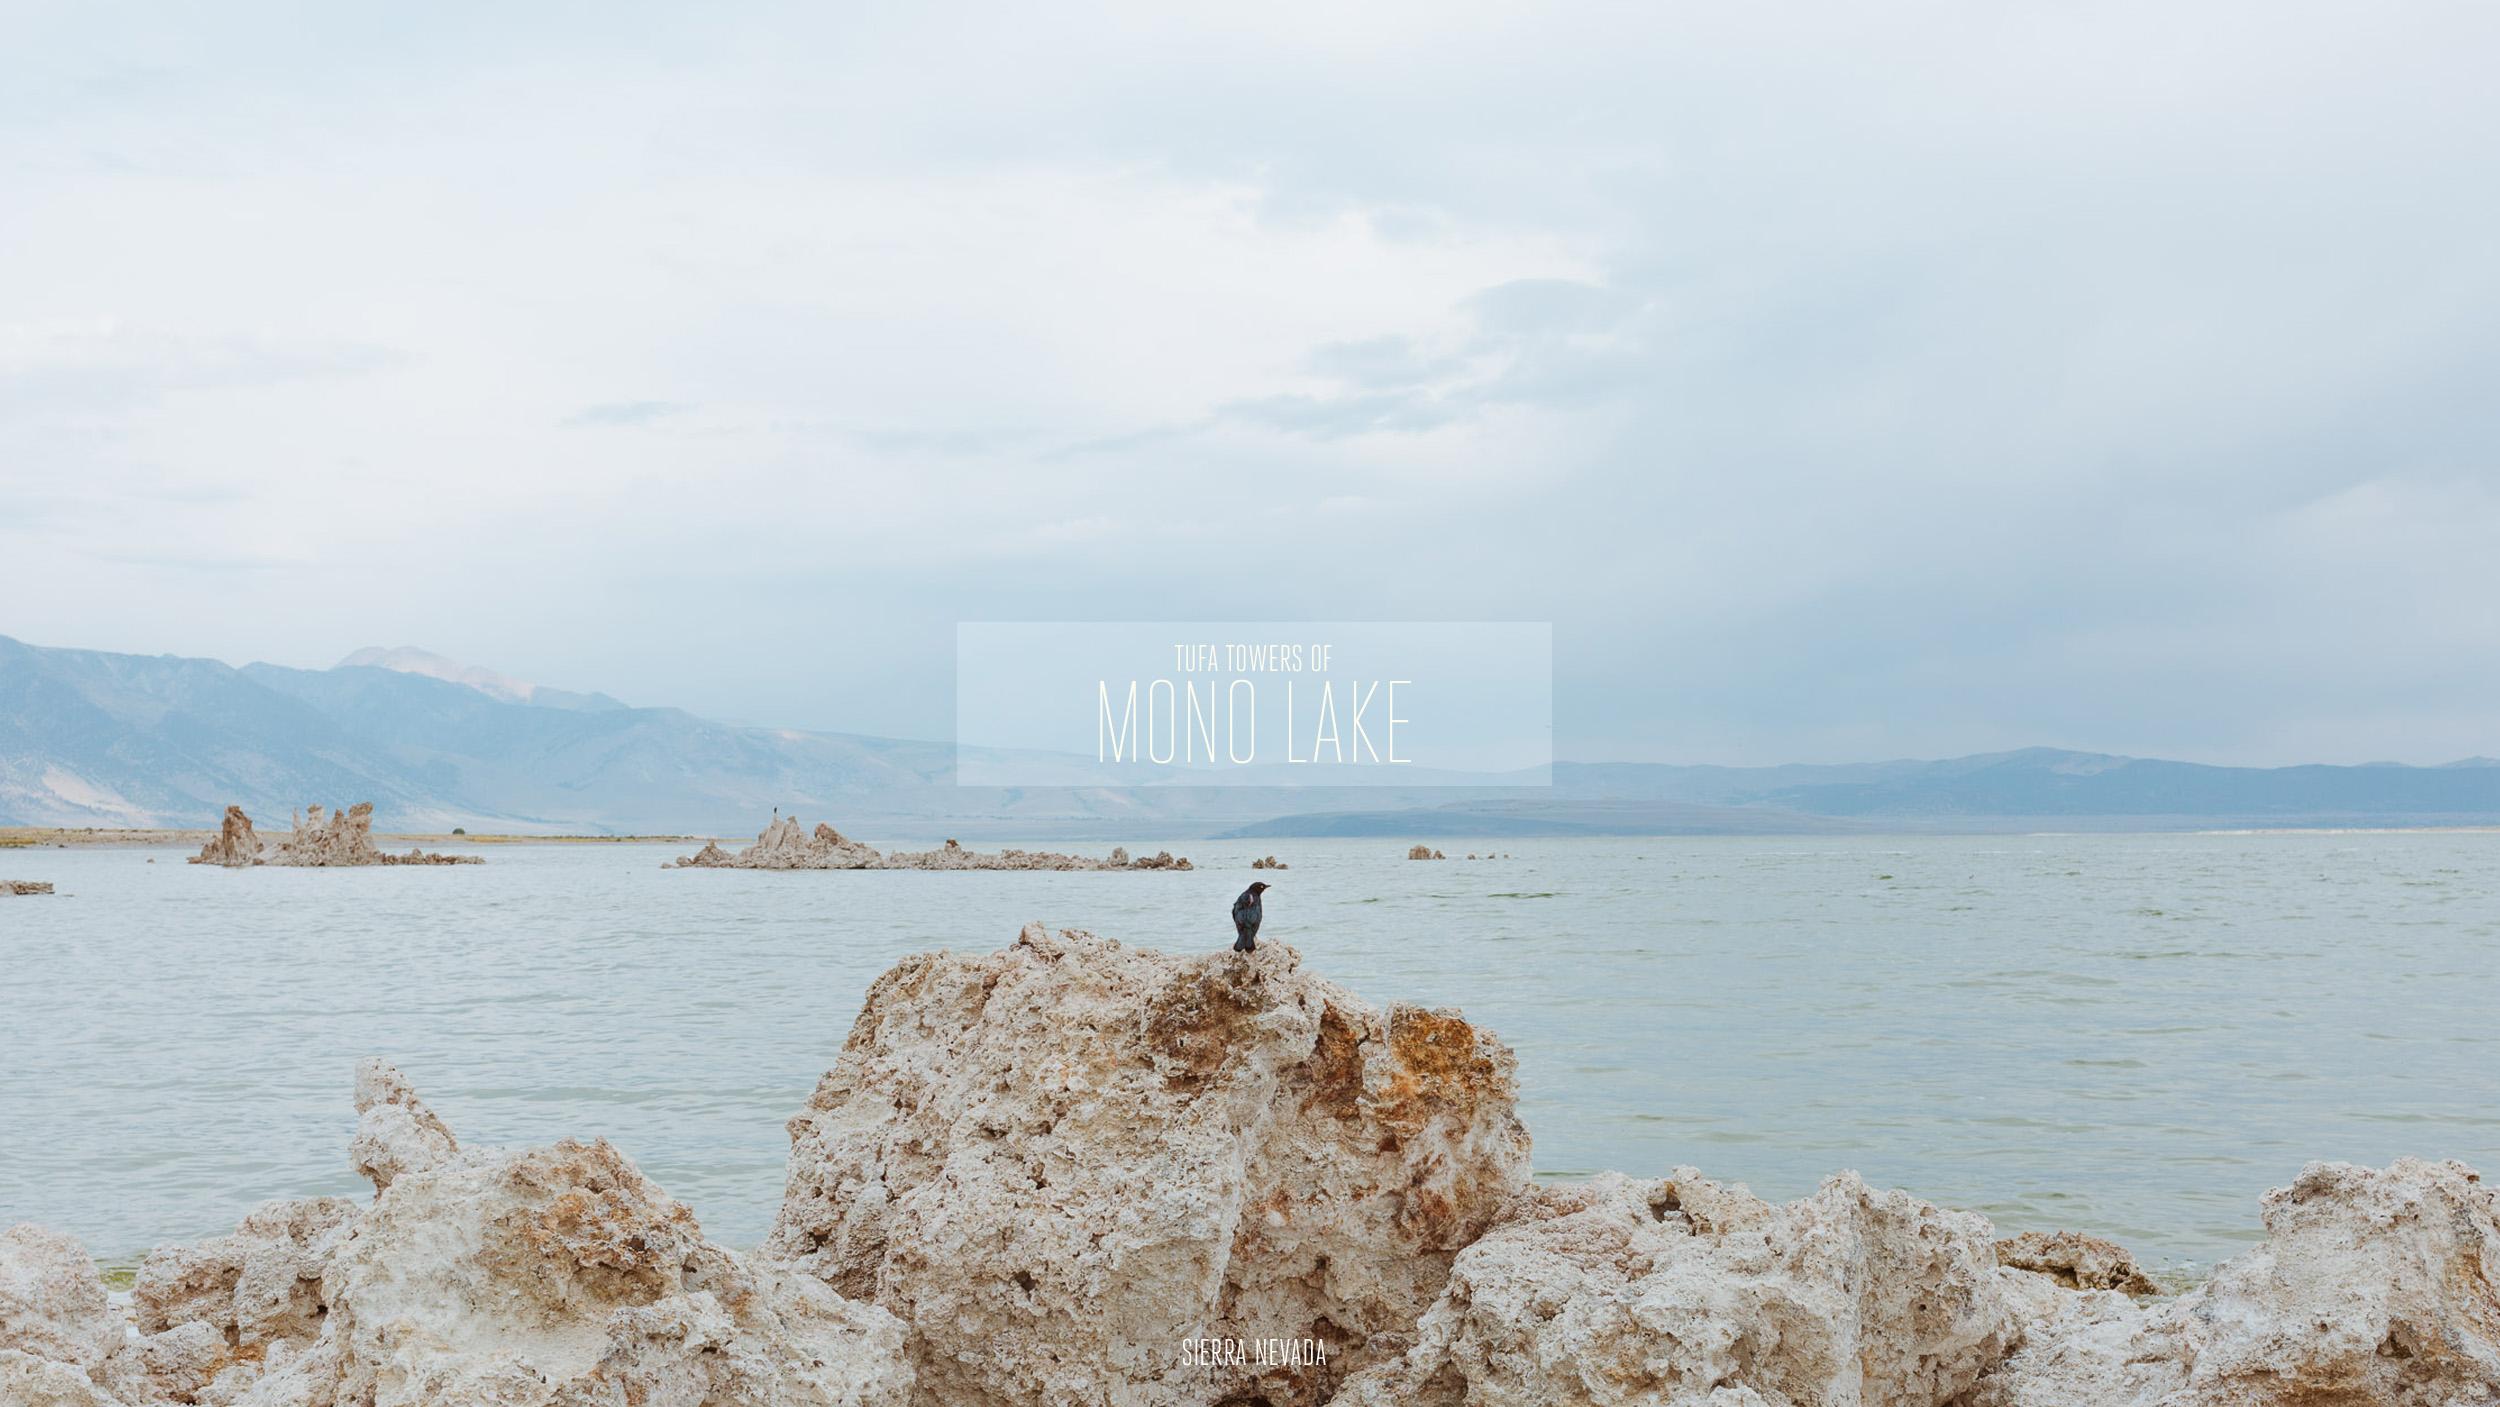 20160821_20160822_MONO_LAKE-COVER.jpg